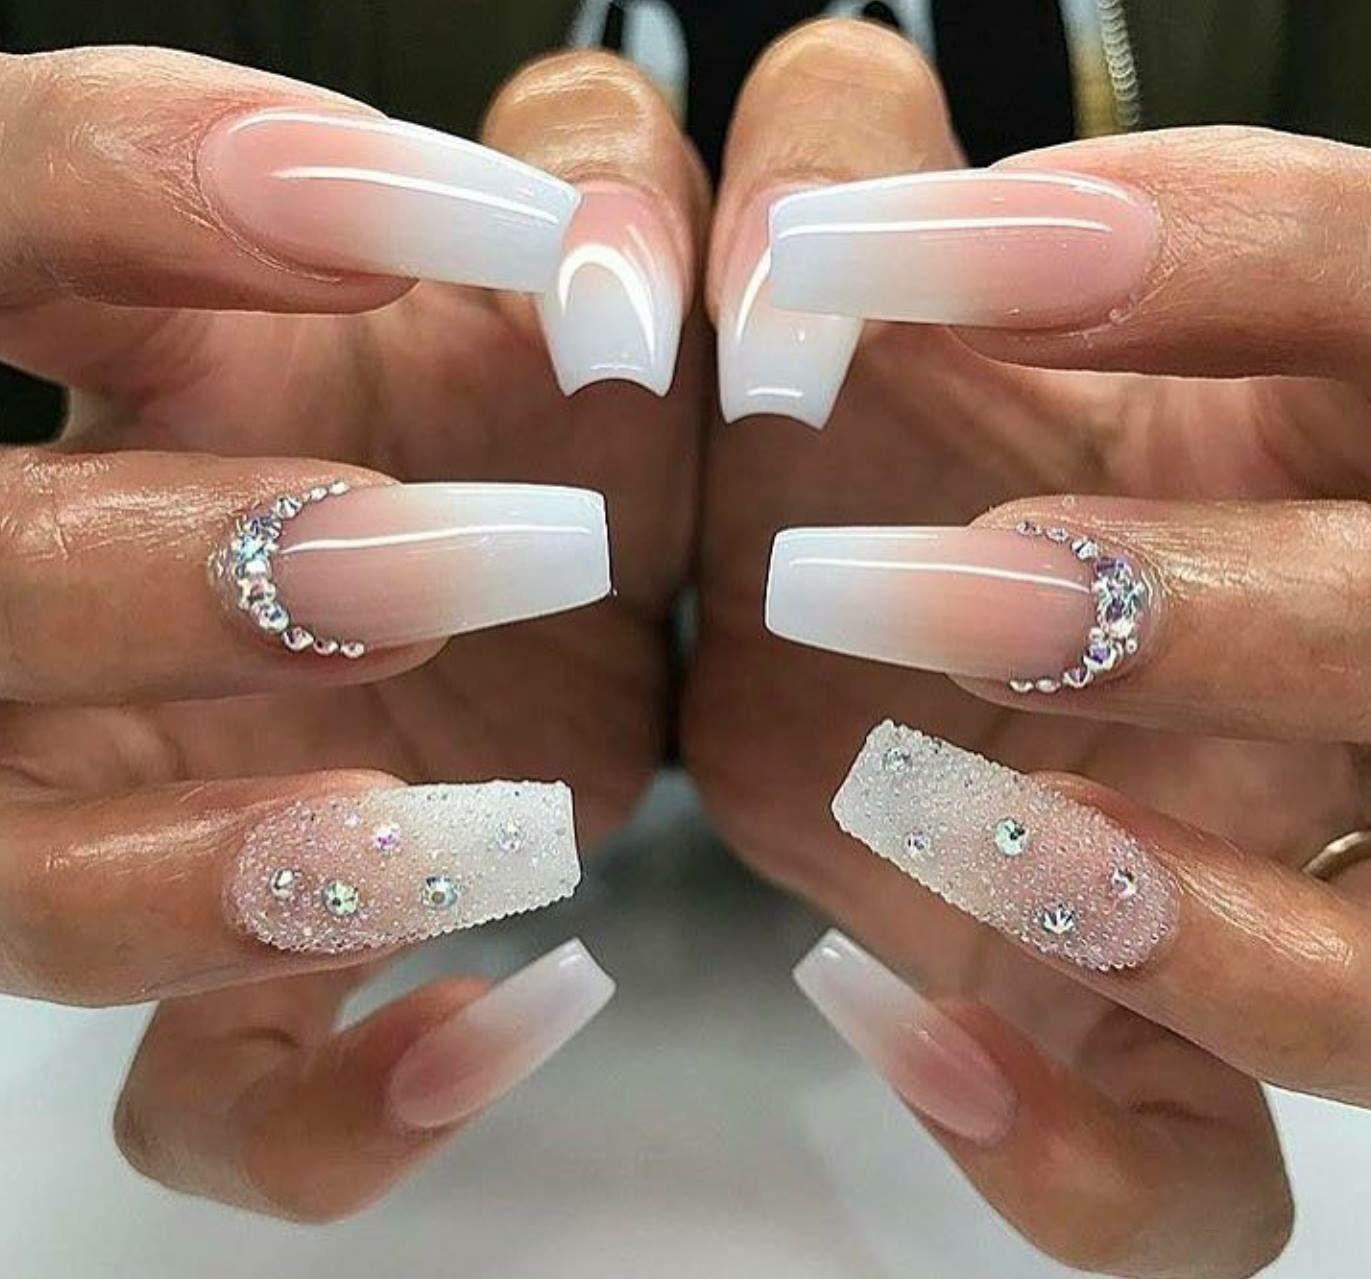 Pin by յɑy$ on ժ ϲƙ ցɾյթթҽɾs | Nails, Acrylic Nails, White ...